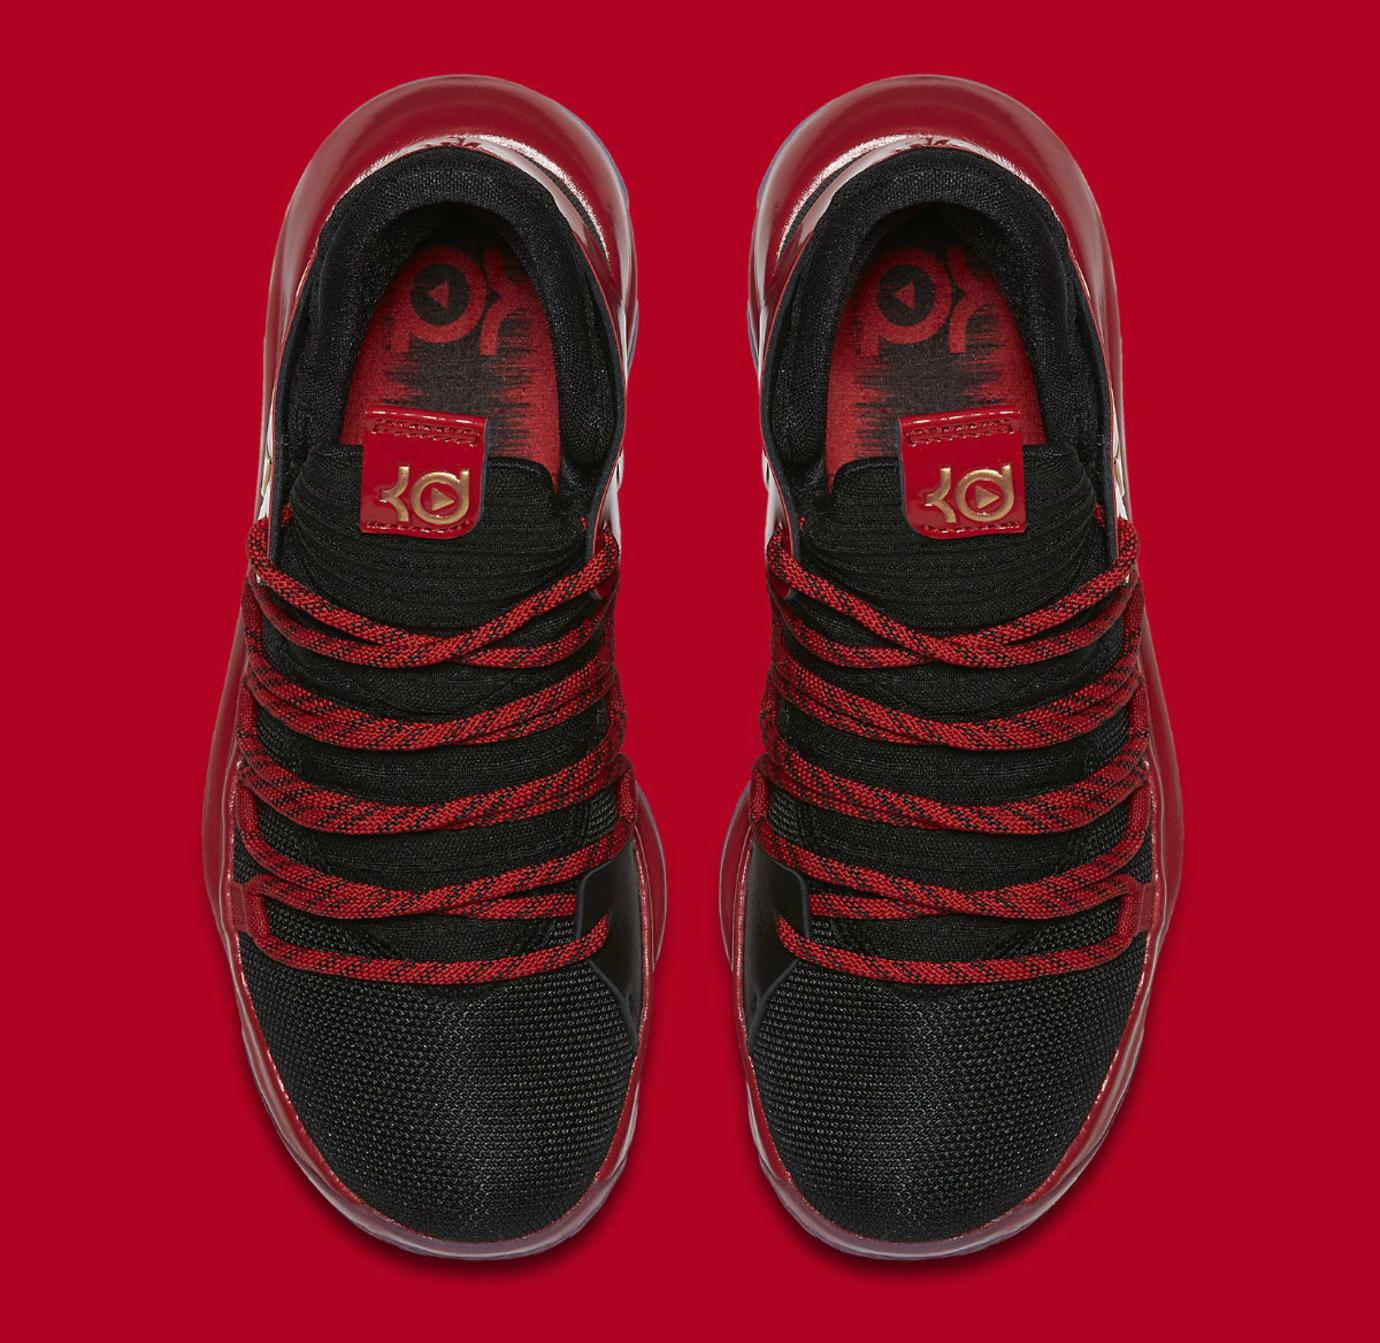 0893b98f4cd39 Nike KD 10 LE GS Black Metallic Gold University Red Bright Crimson Release  Date AJ7220-